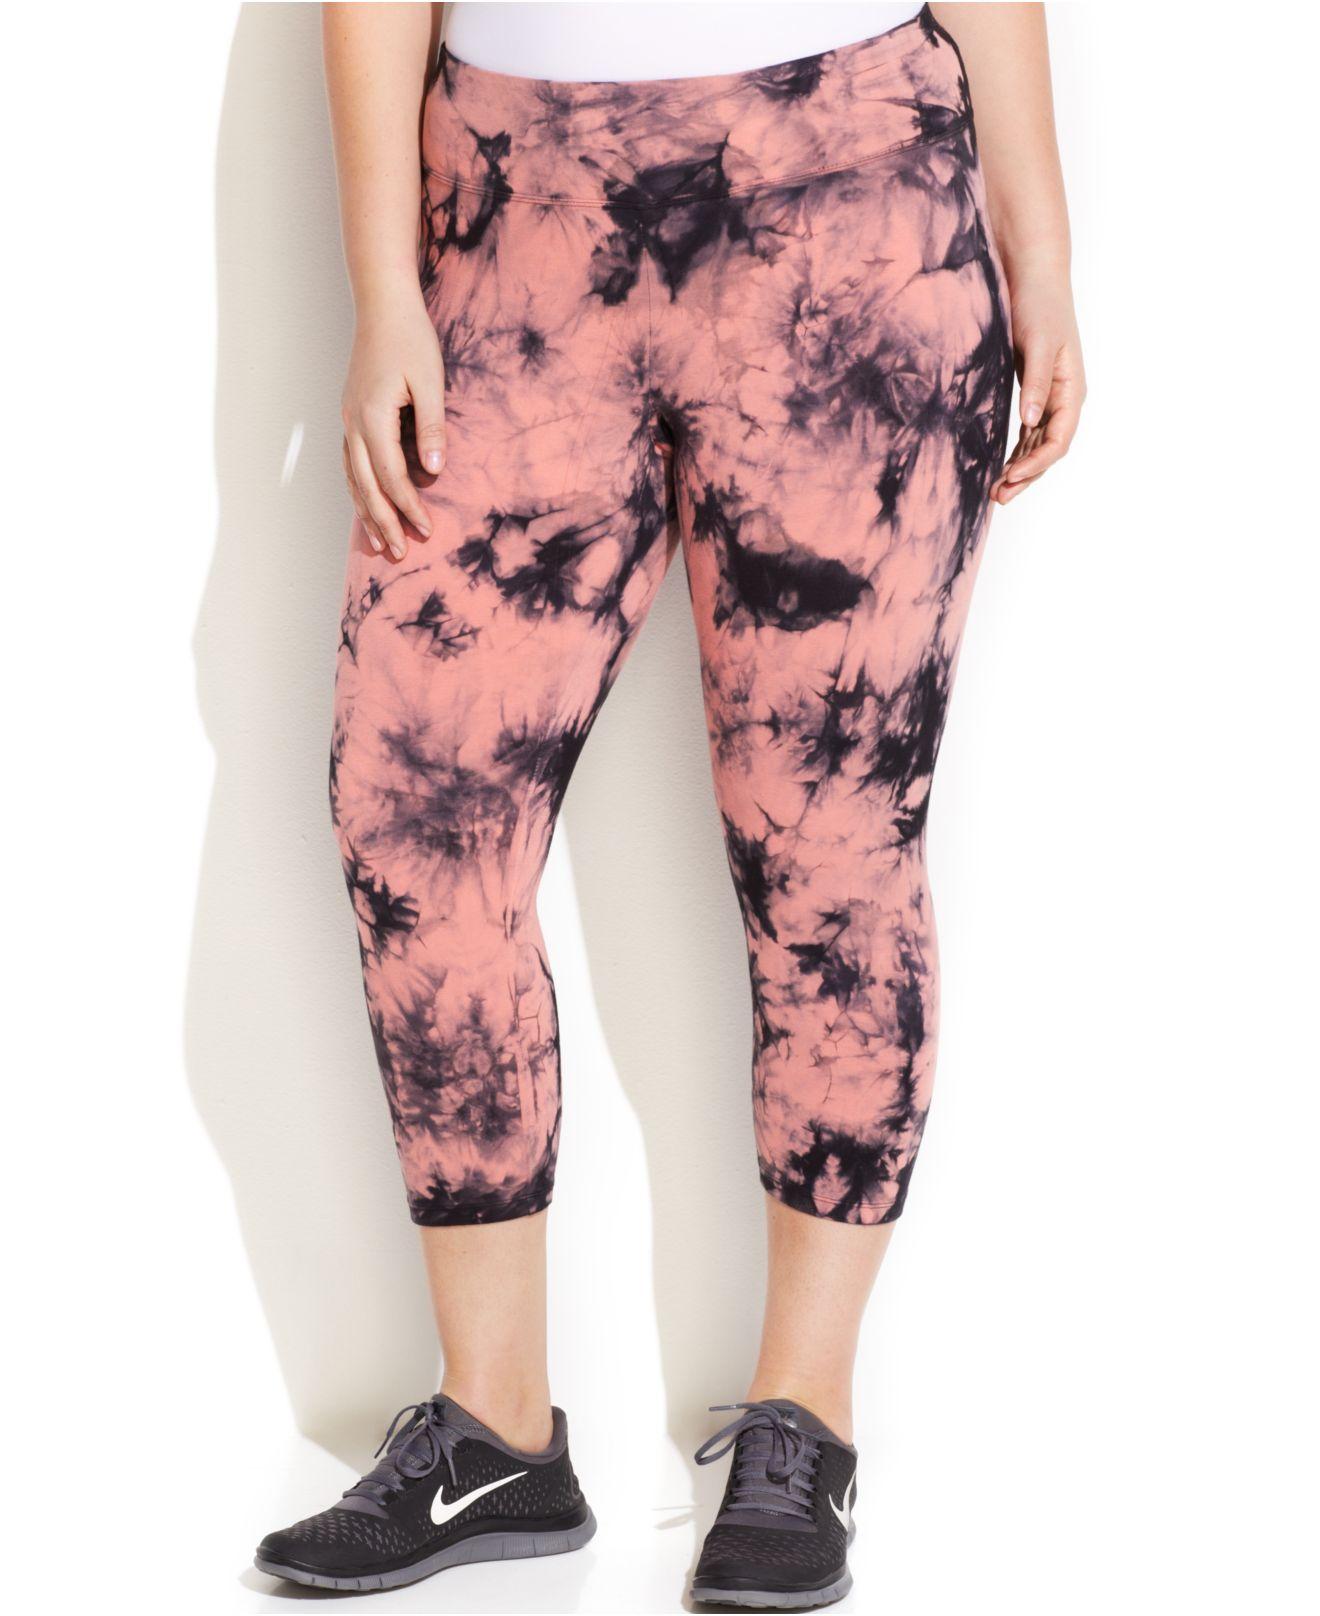 cc08e7bf03902 Lyst - Calvin Klein Performance Plus Size Tie-Dye Capri Leggings in Pink